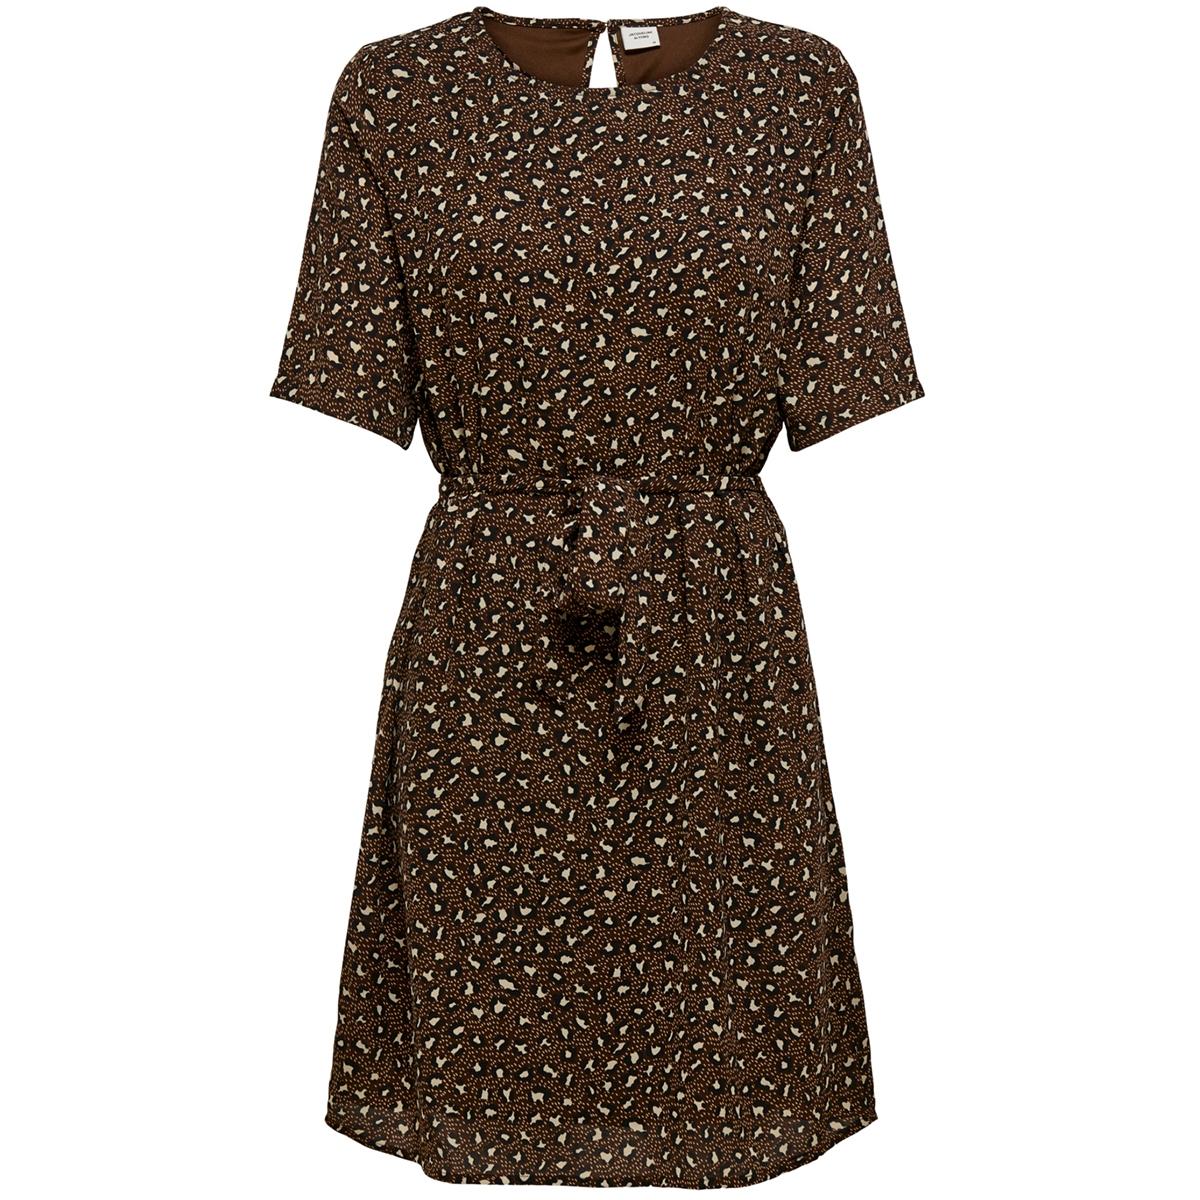 jdyricci 2/4 belt dress wvn 15203378 jacqueline de yong jurk chicory coffee/ leo